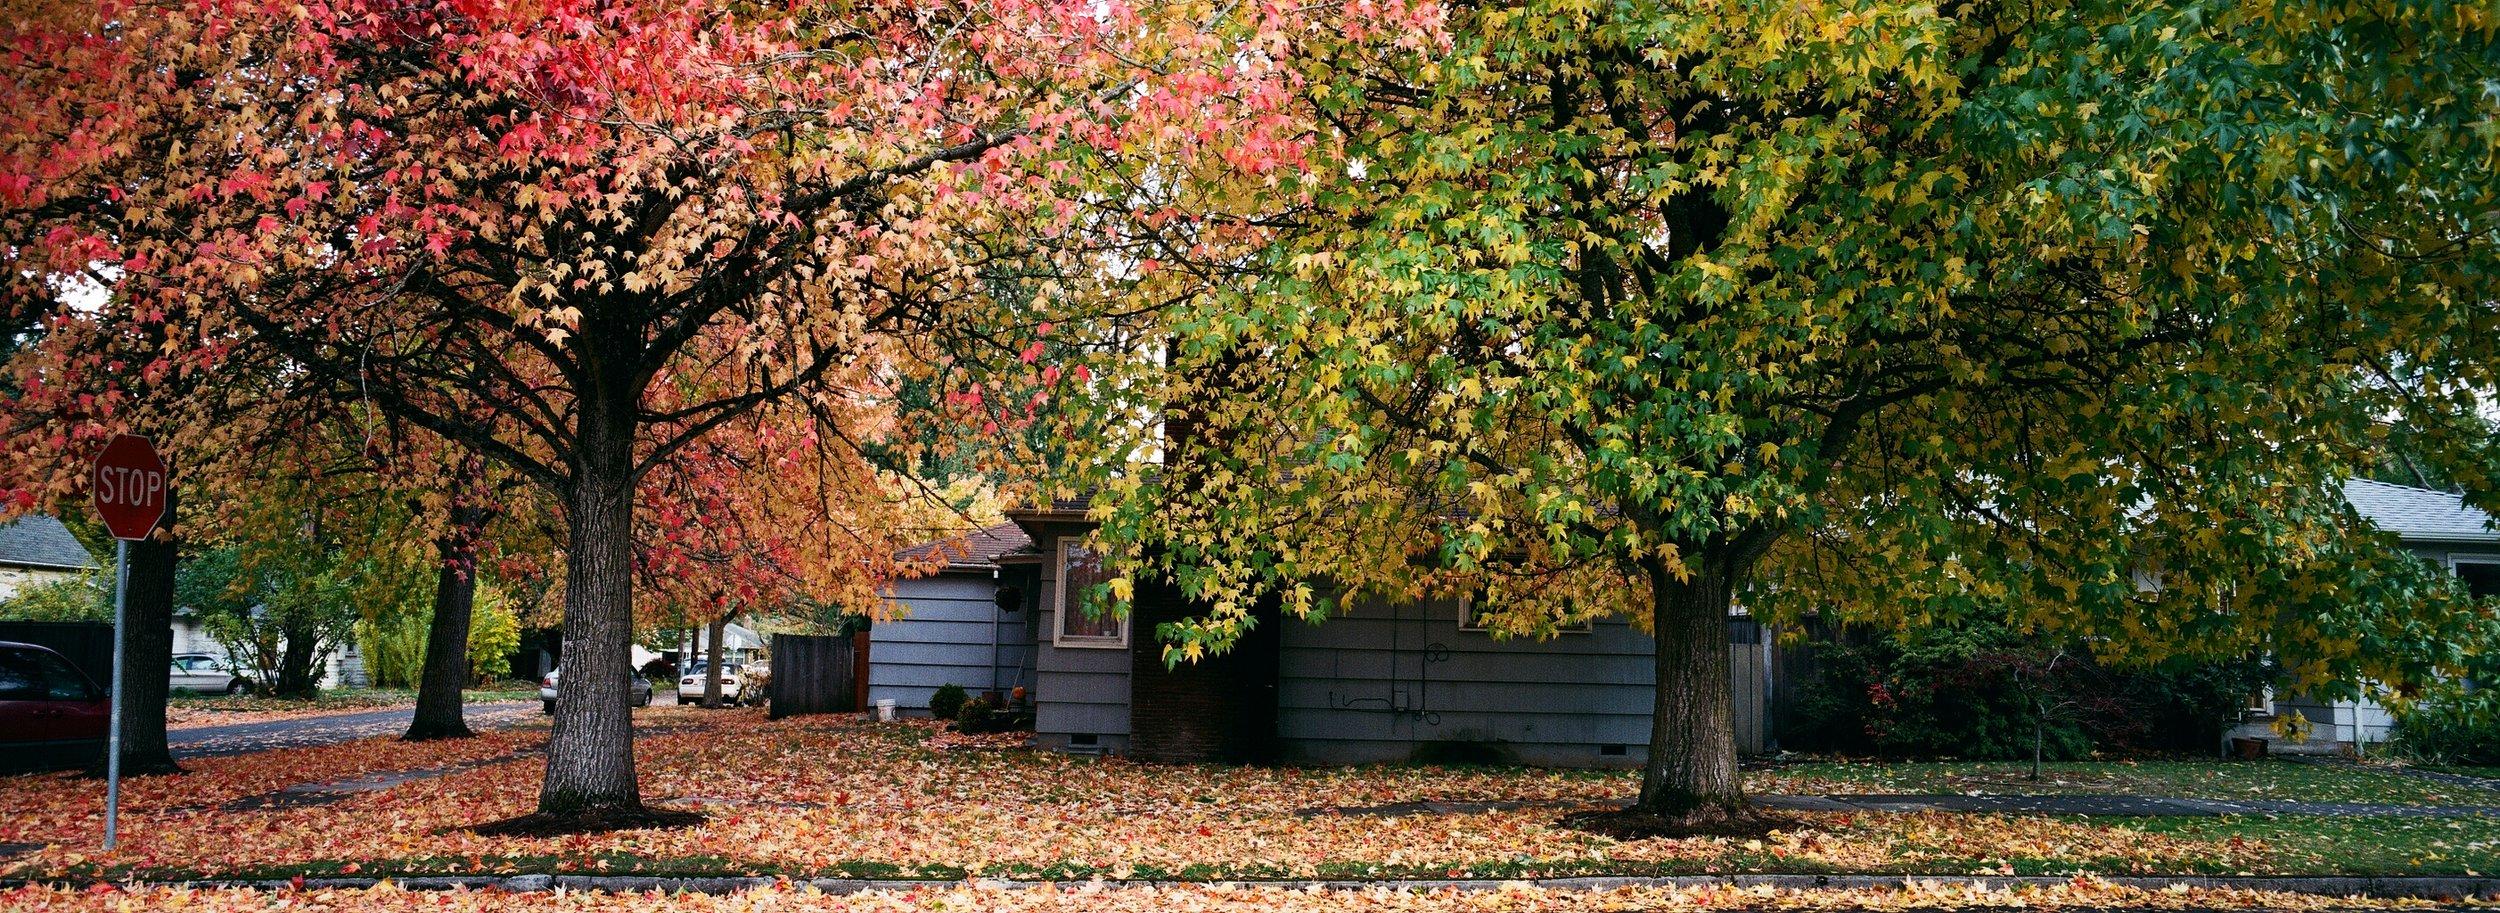 Fall colors in Portland, OR; Superia X-TRA 400